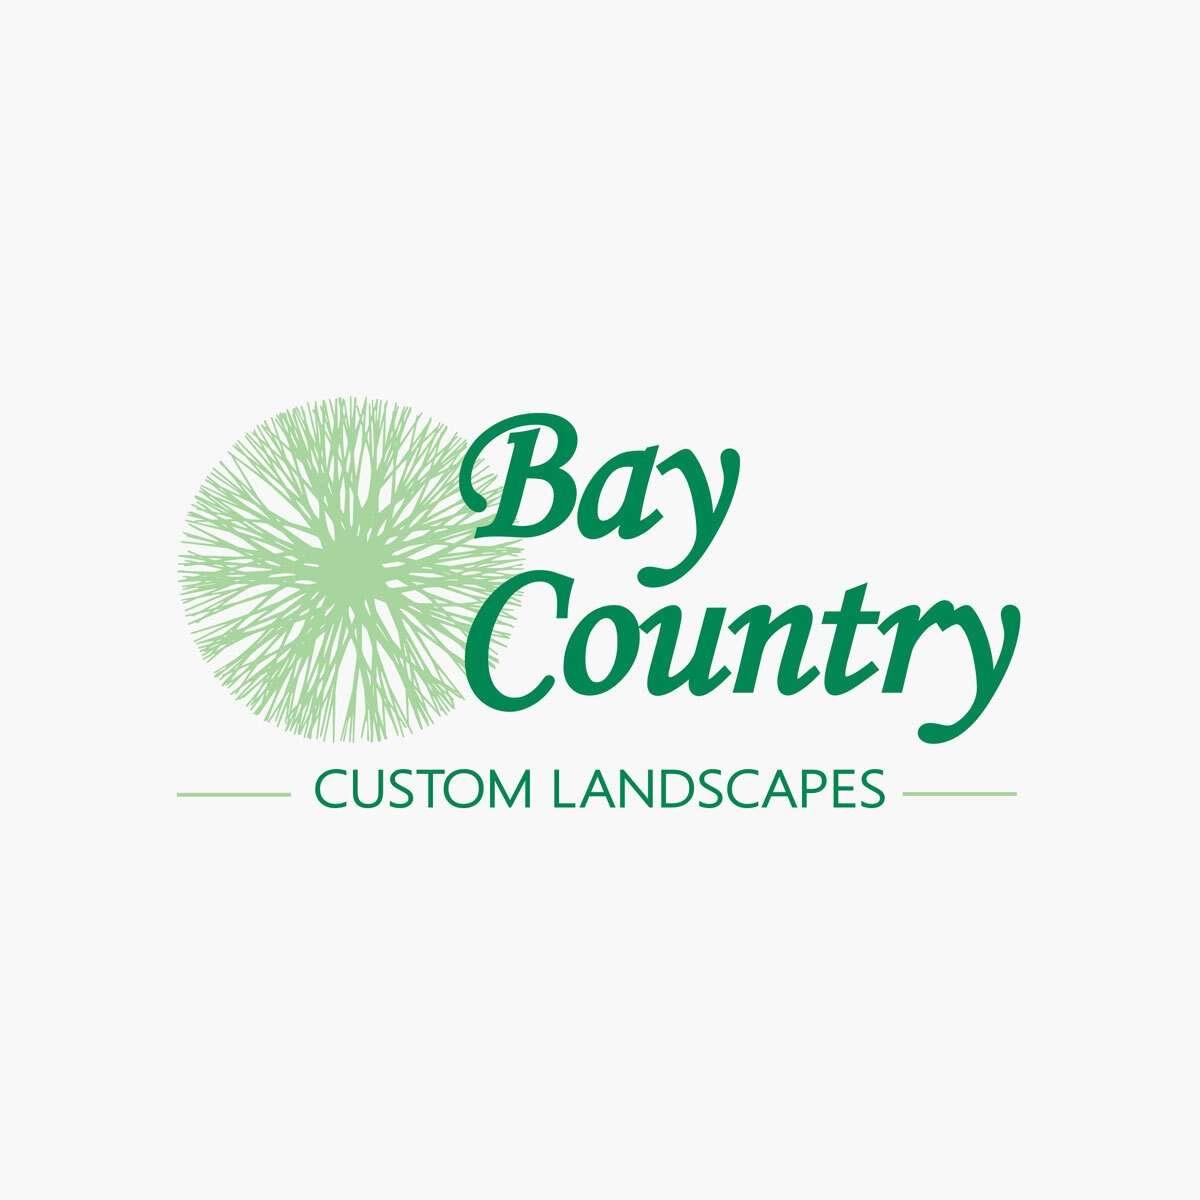 Bay Country Logo Design by BrandSwan, a logo design company